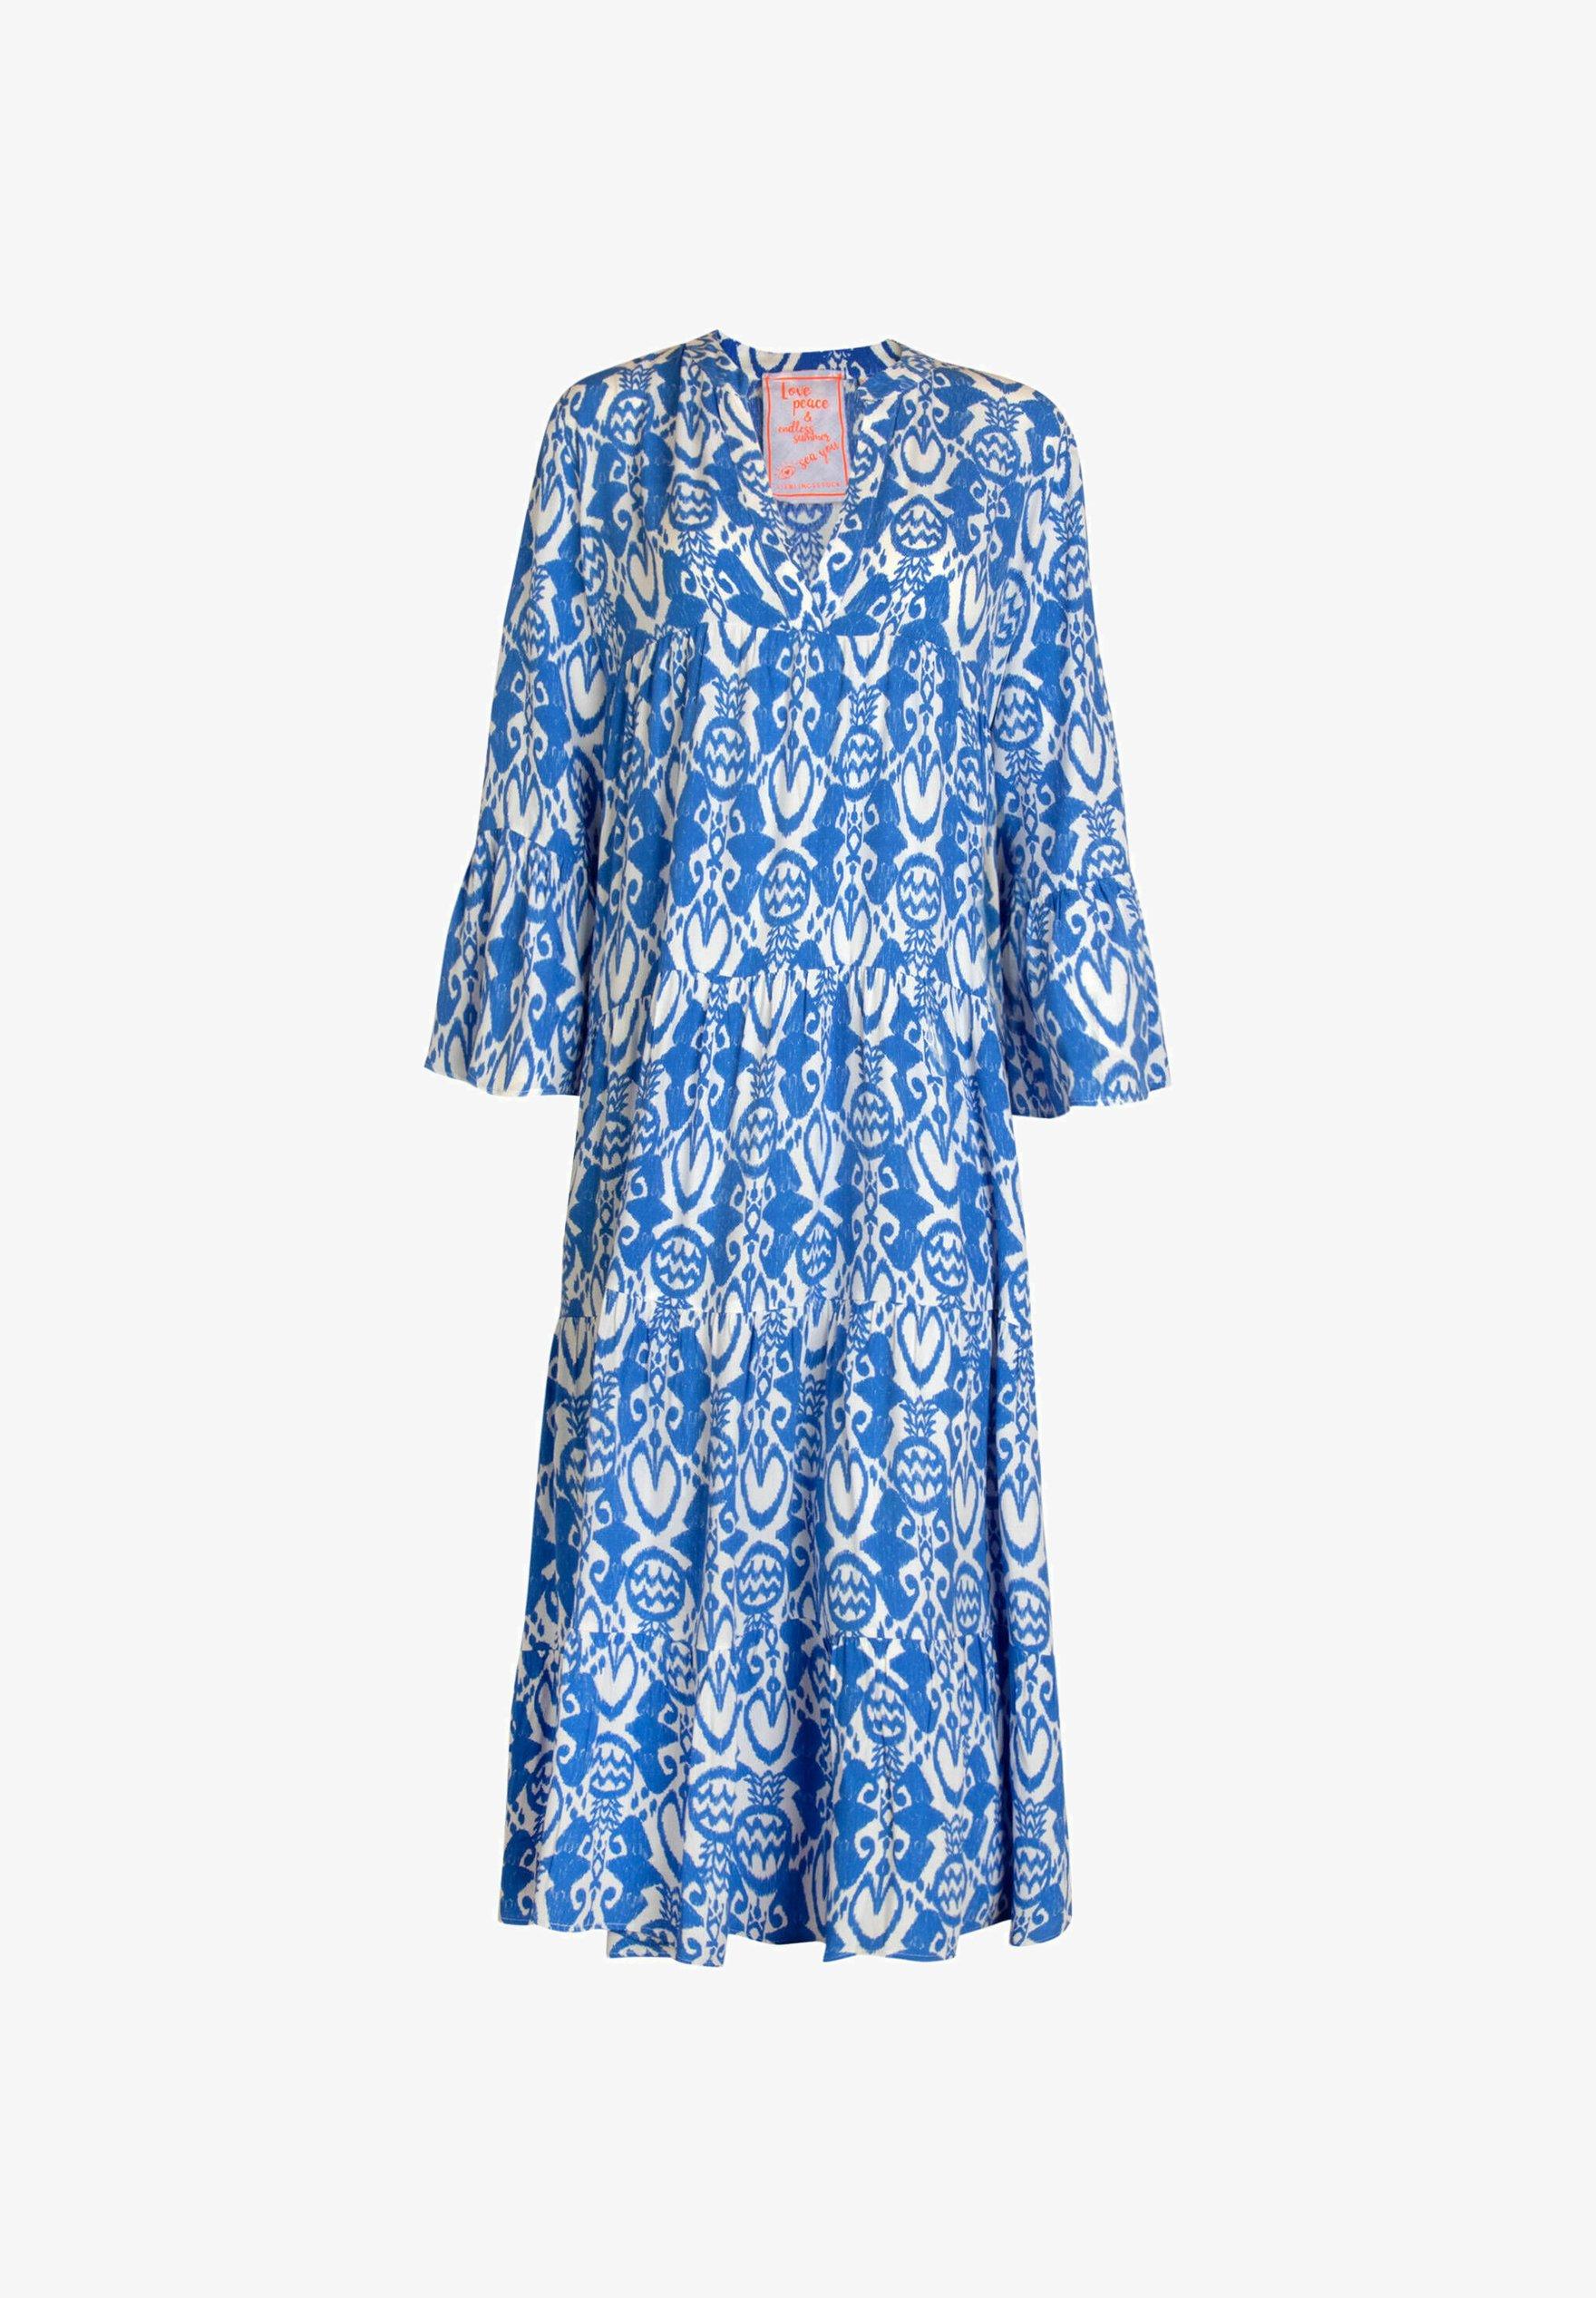 Lieblingsstuck Damen Sommerkleid Eldal Day Dress Blau 51 Blue Zalando De